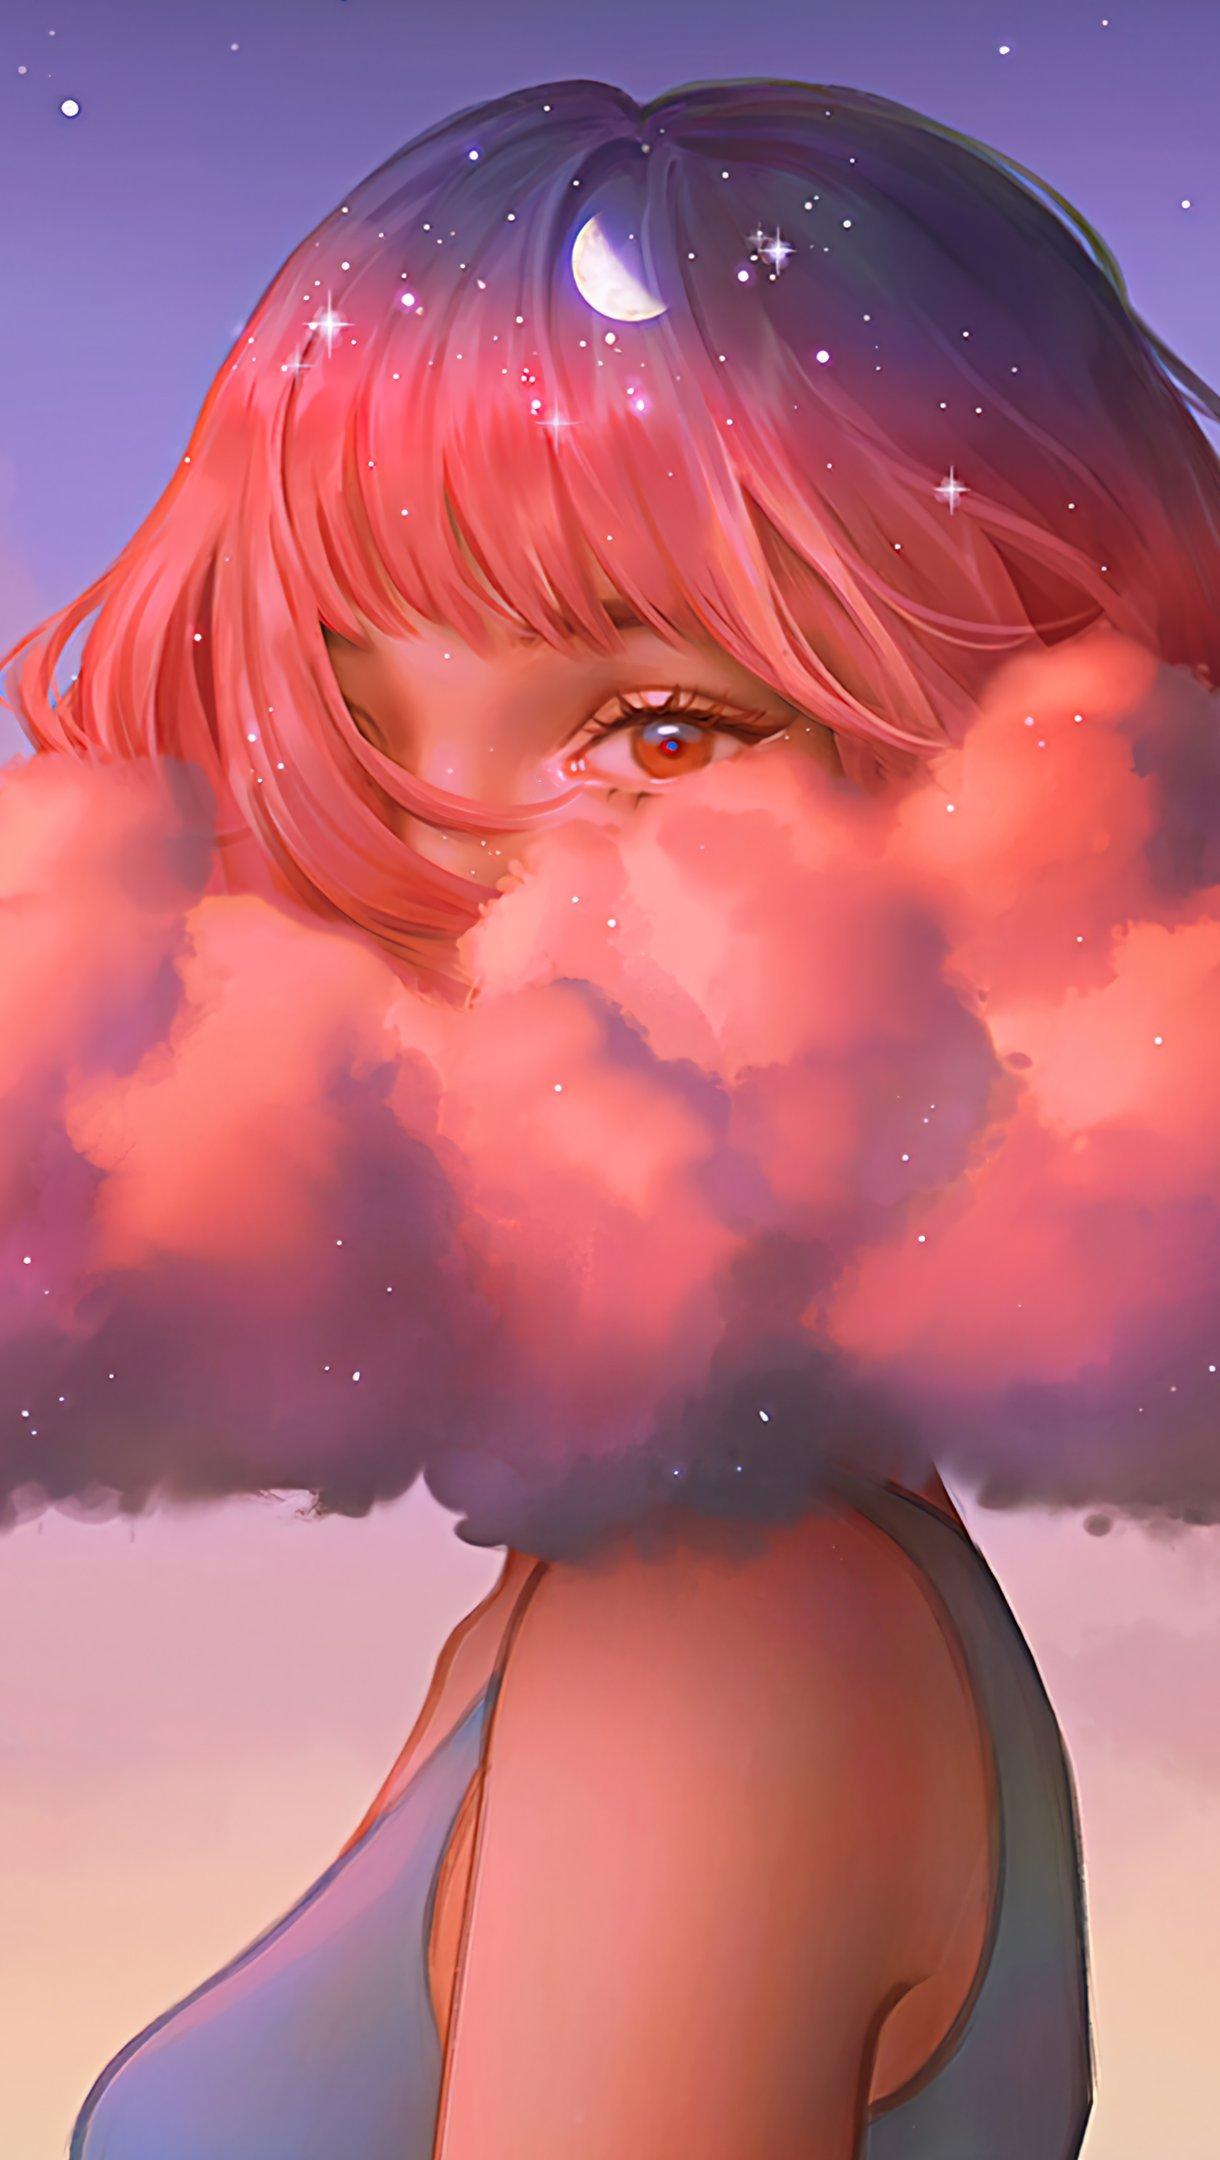 Fondos de pantalla Chica cubierta de nubes Vertical